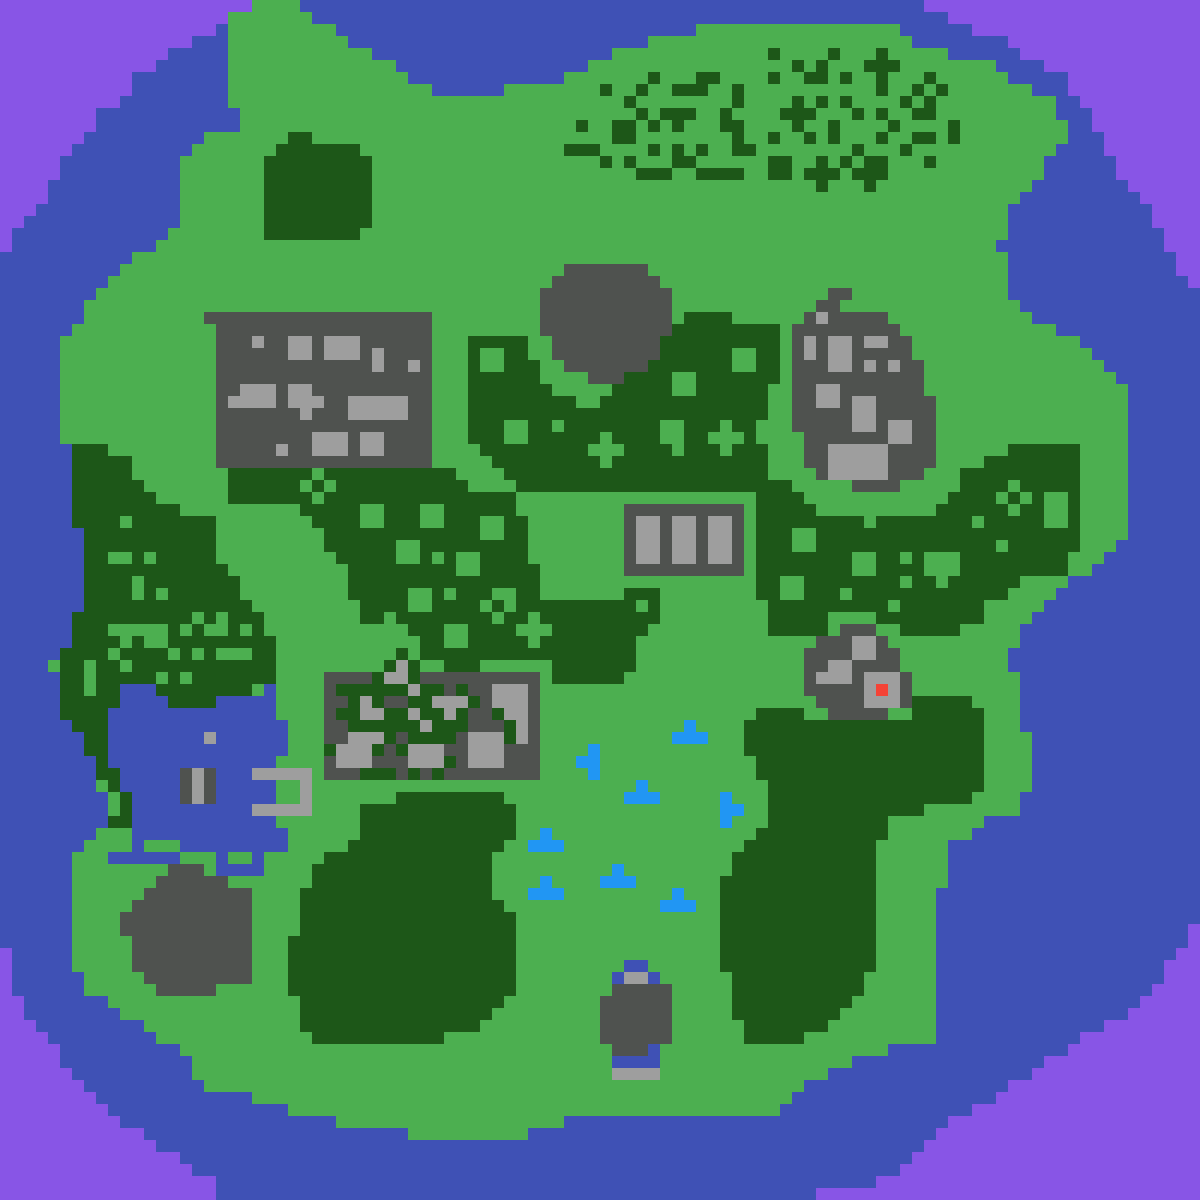 Pixilart  fortnite inspired map by Hill